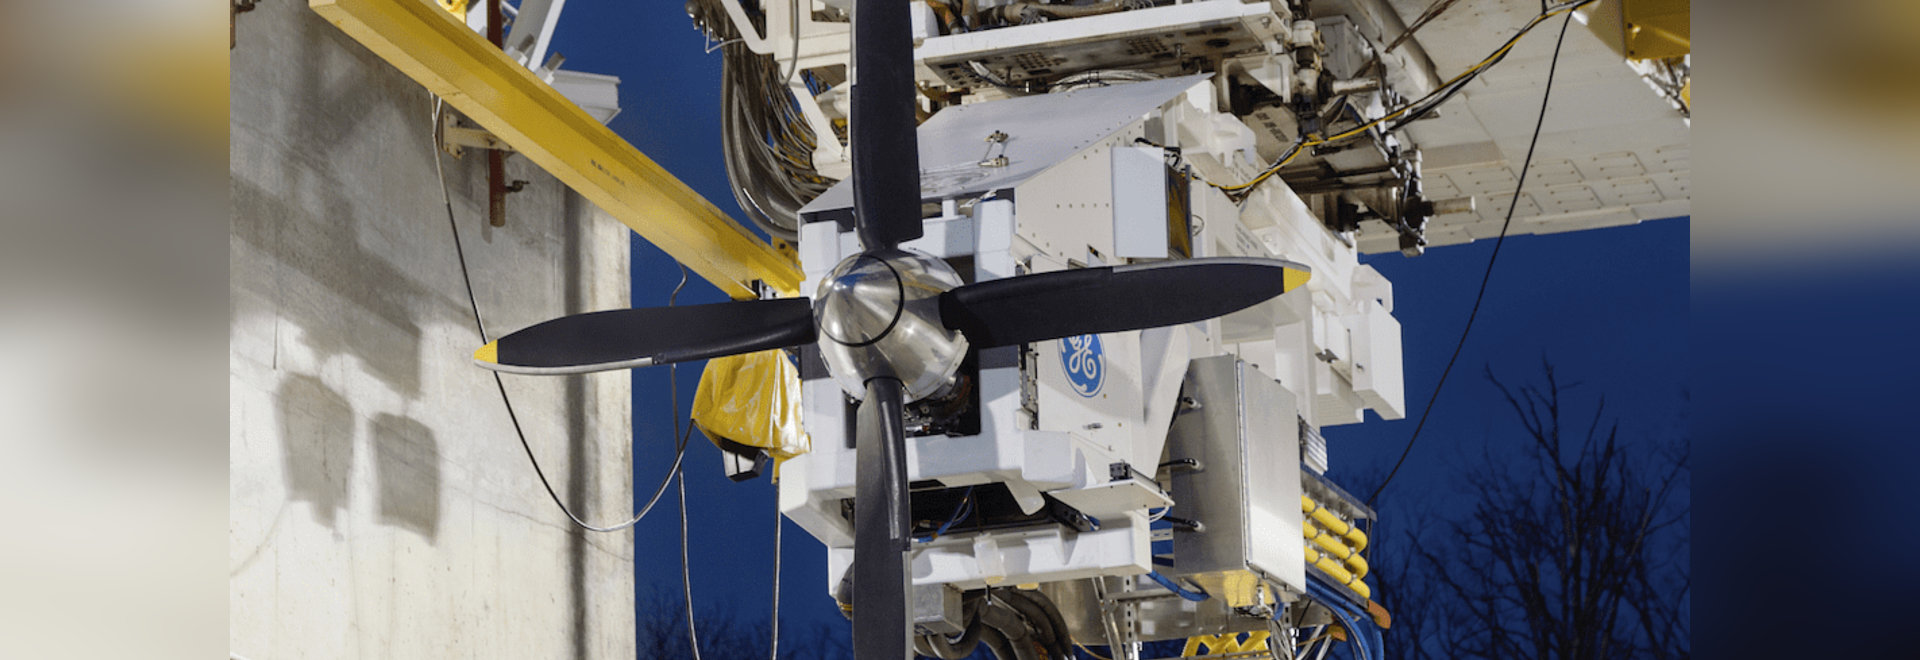 Hybrid-electric motor generator test at Peebles Test Operation in Peebles, Ohio.